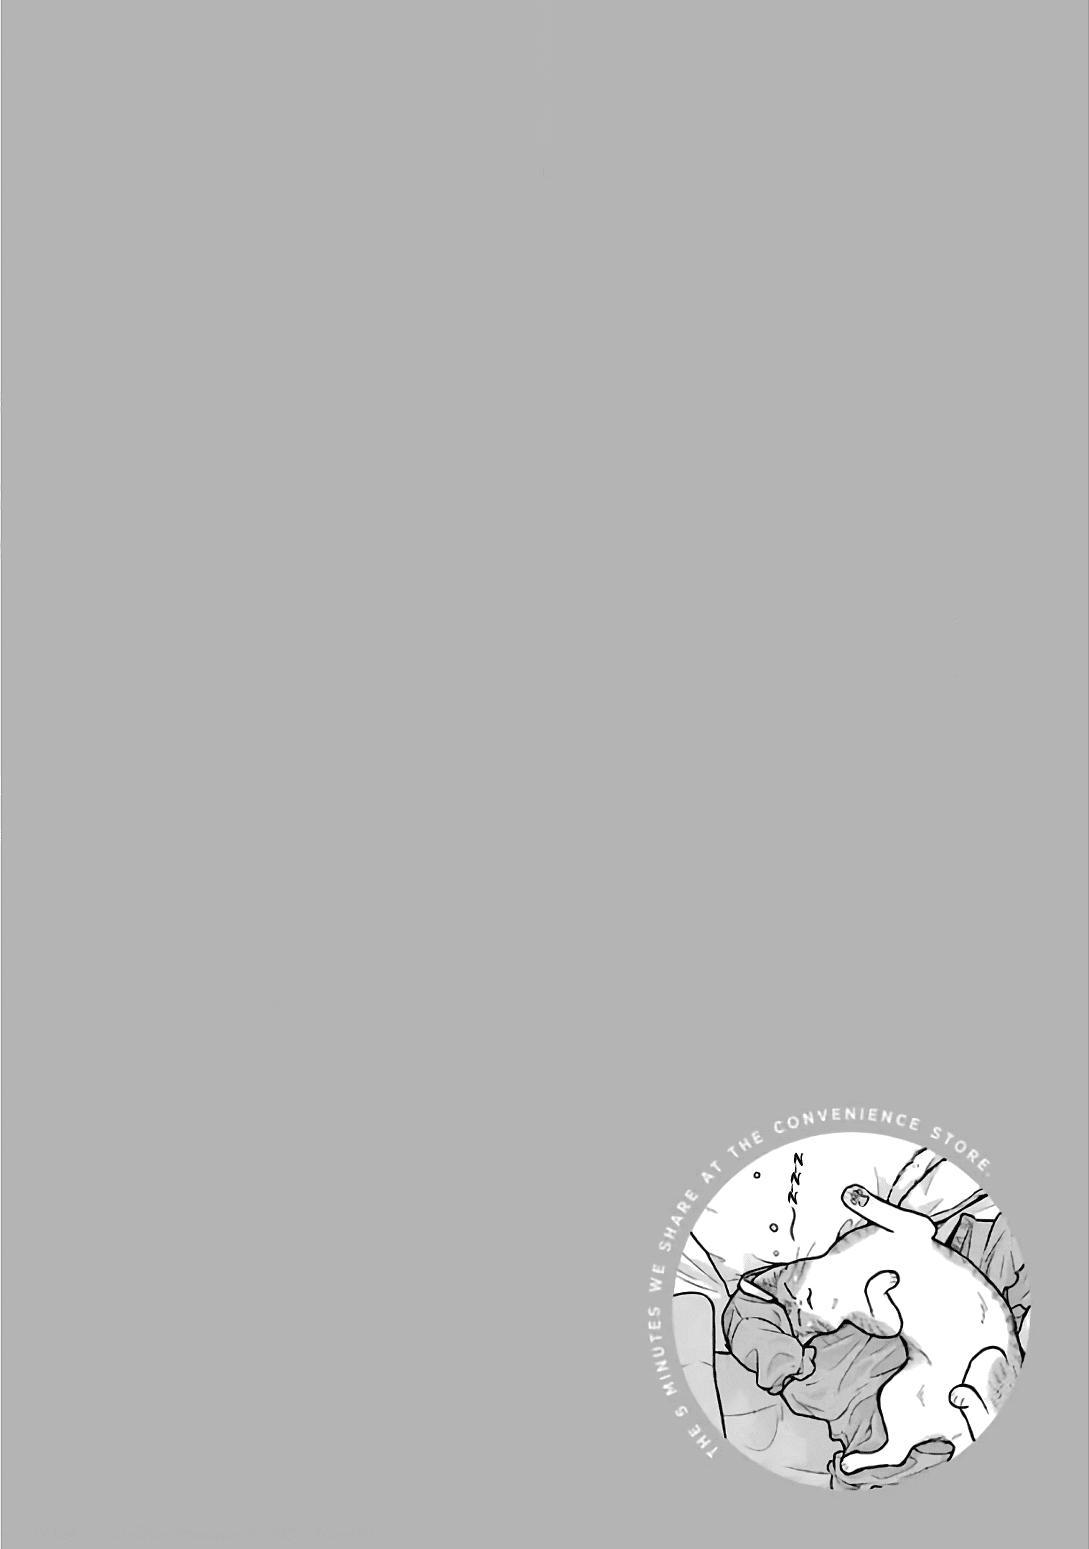 5 Minutes With You At A Convenience Store Chapter 19 page 10 - Mangakakalots.com